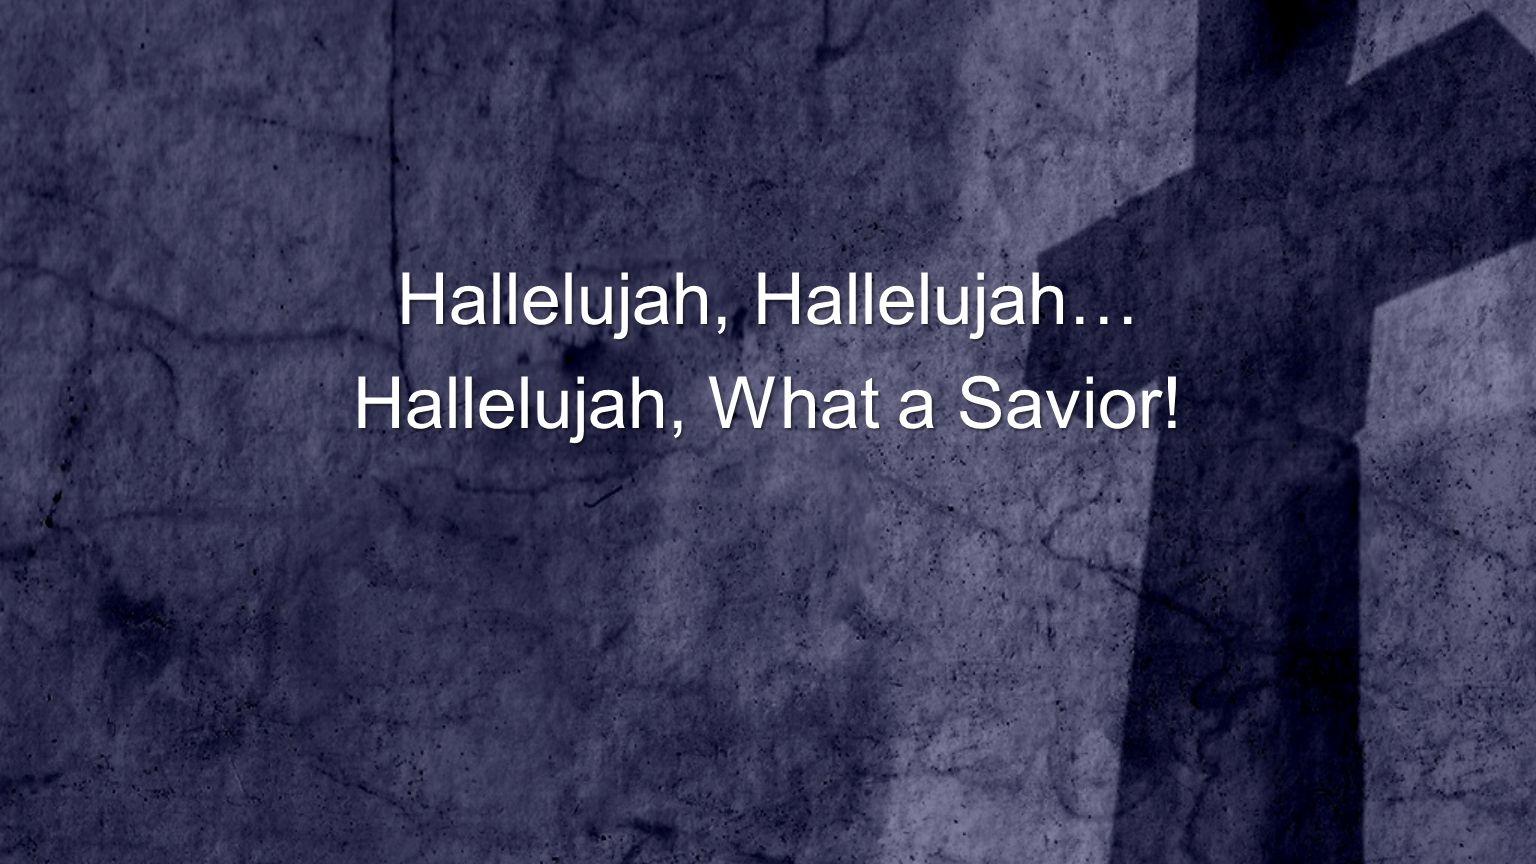 Hallelujah, Hallelujah… Hallelujah, What a Savior!